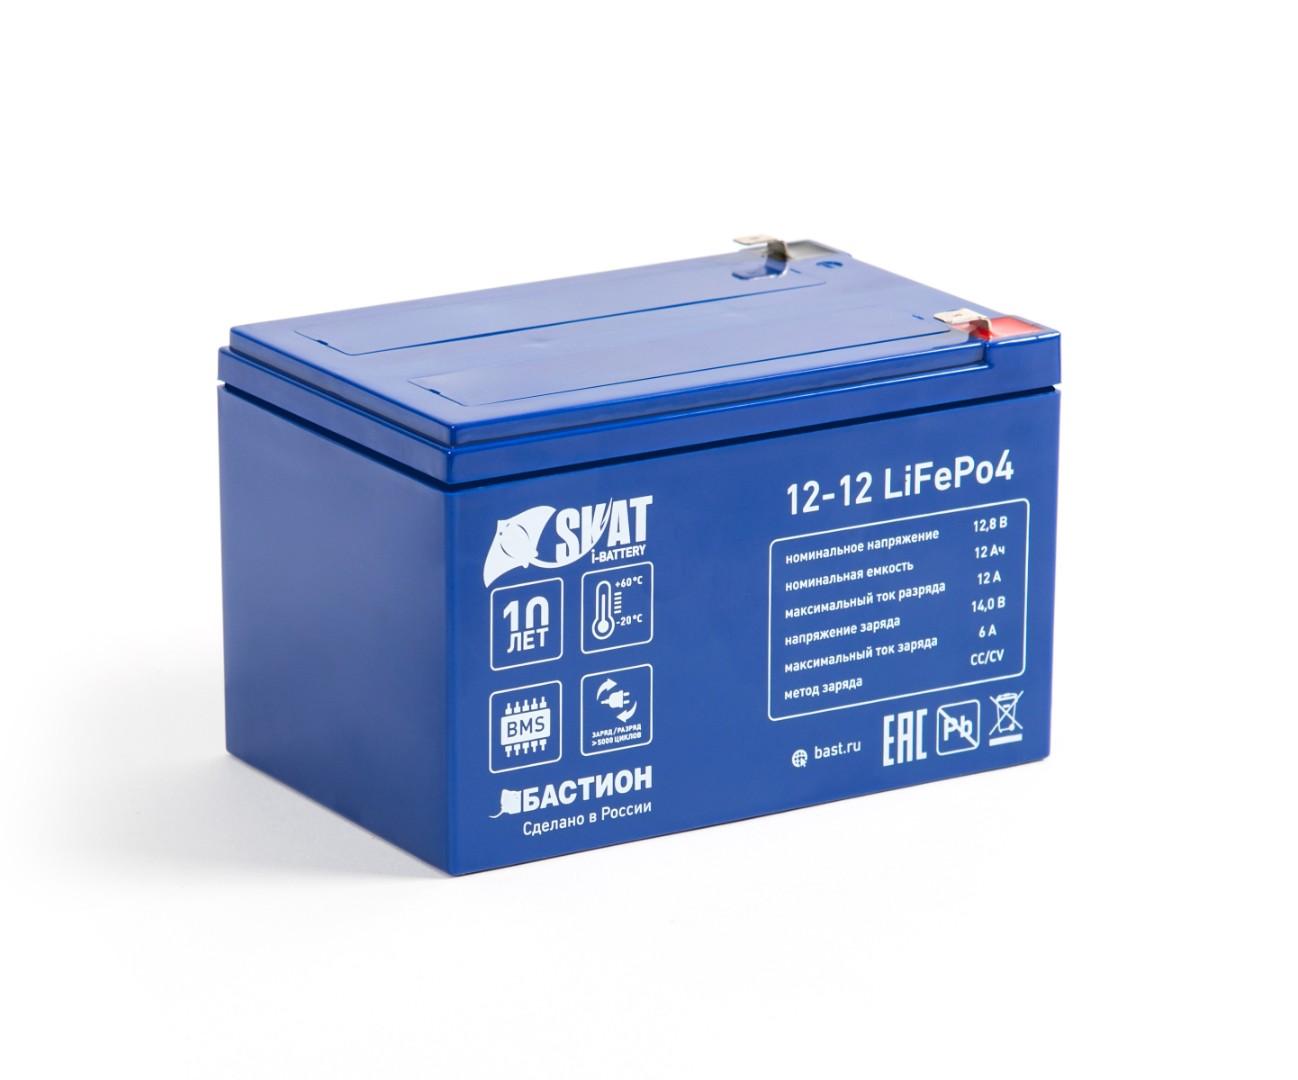 Аккумулятор Skat i-Battery 12-12 LiFePo4